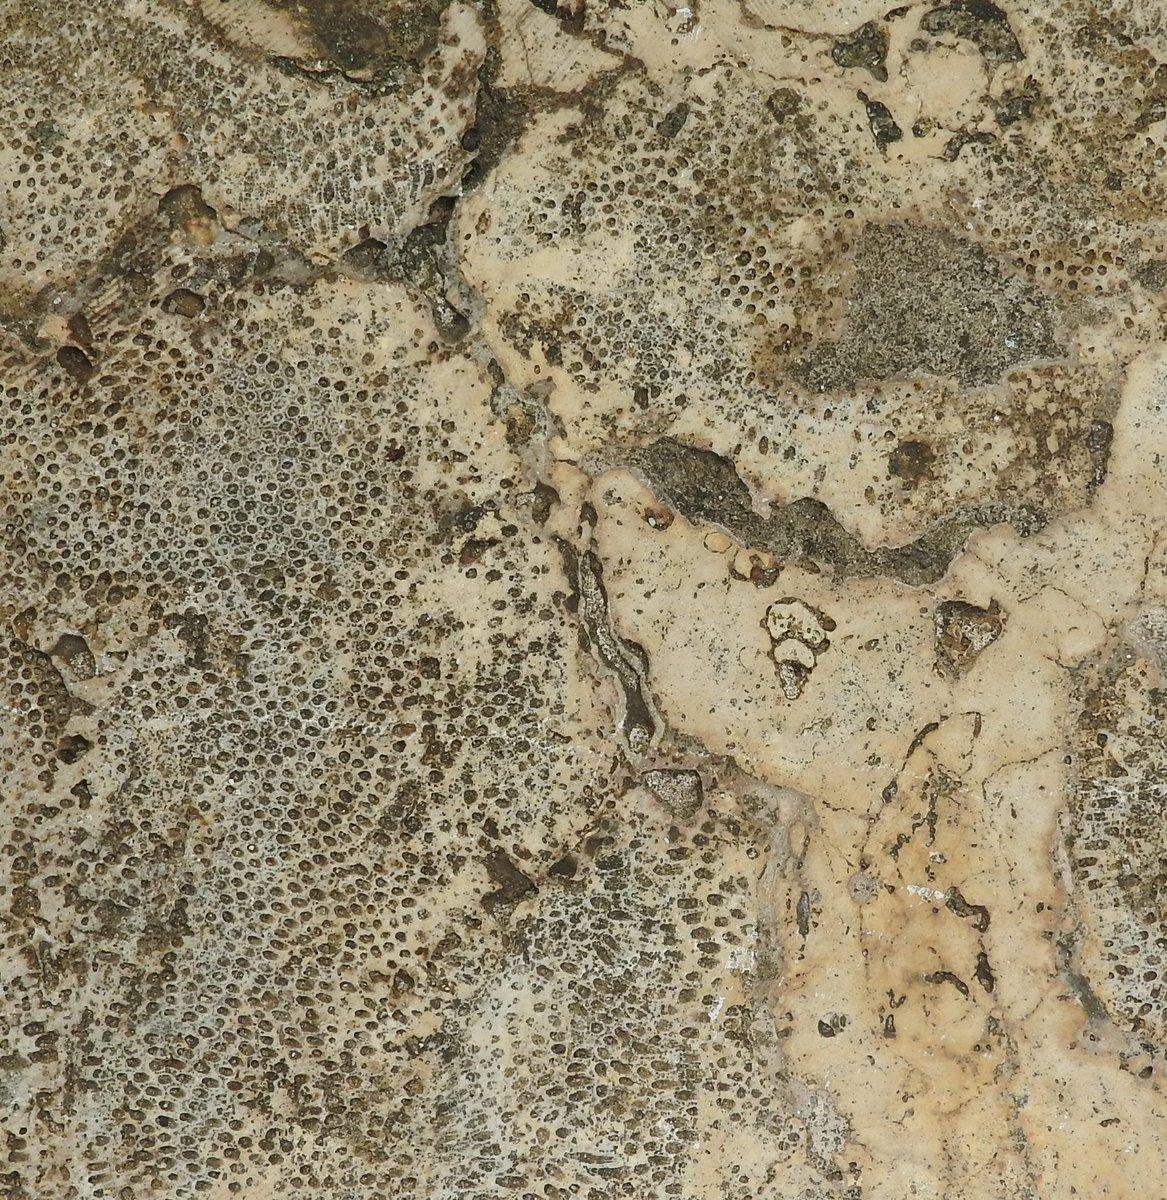 "steven stokowski, pg on twitter: ""various corals, bryozoans"